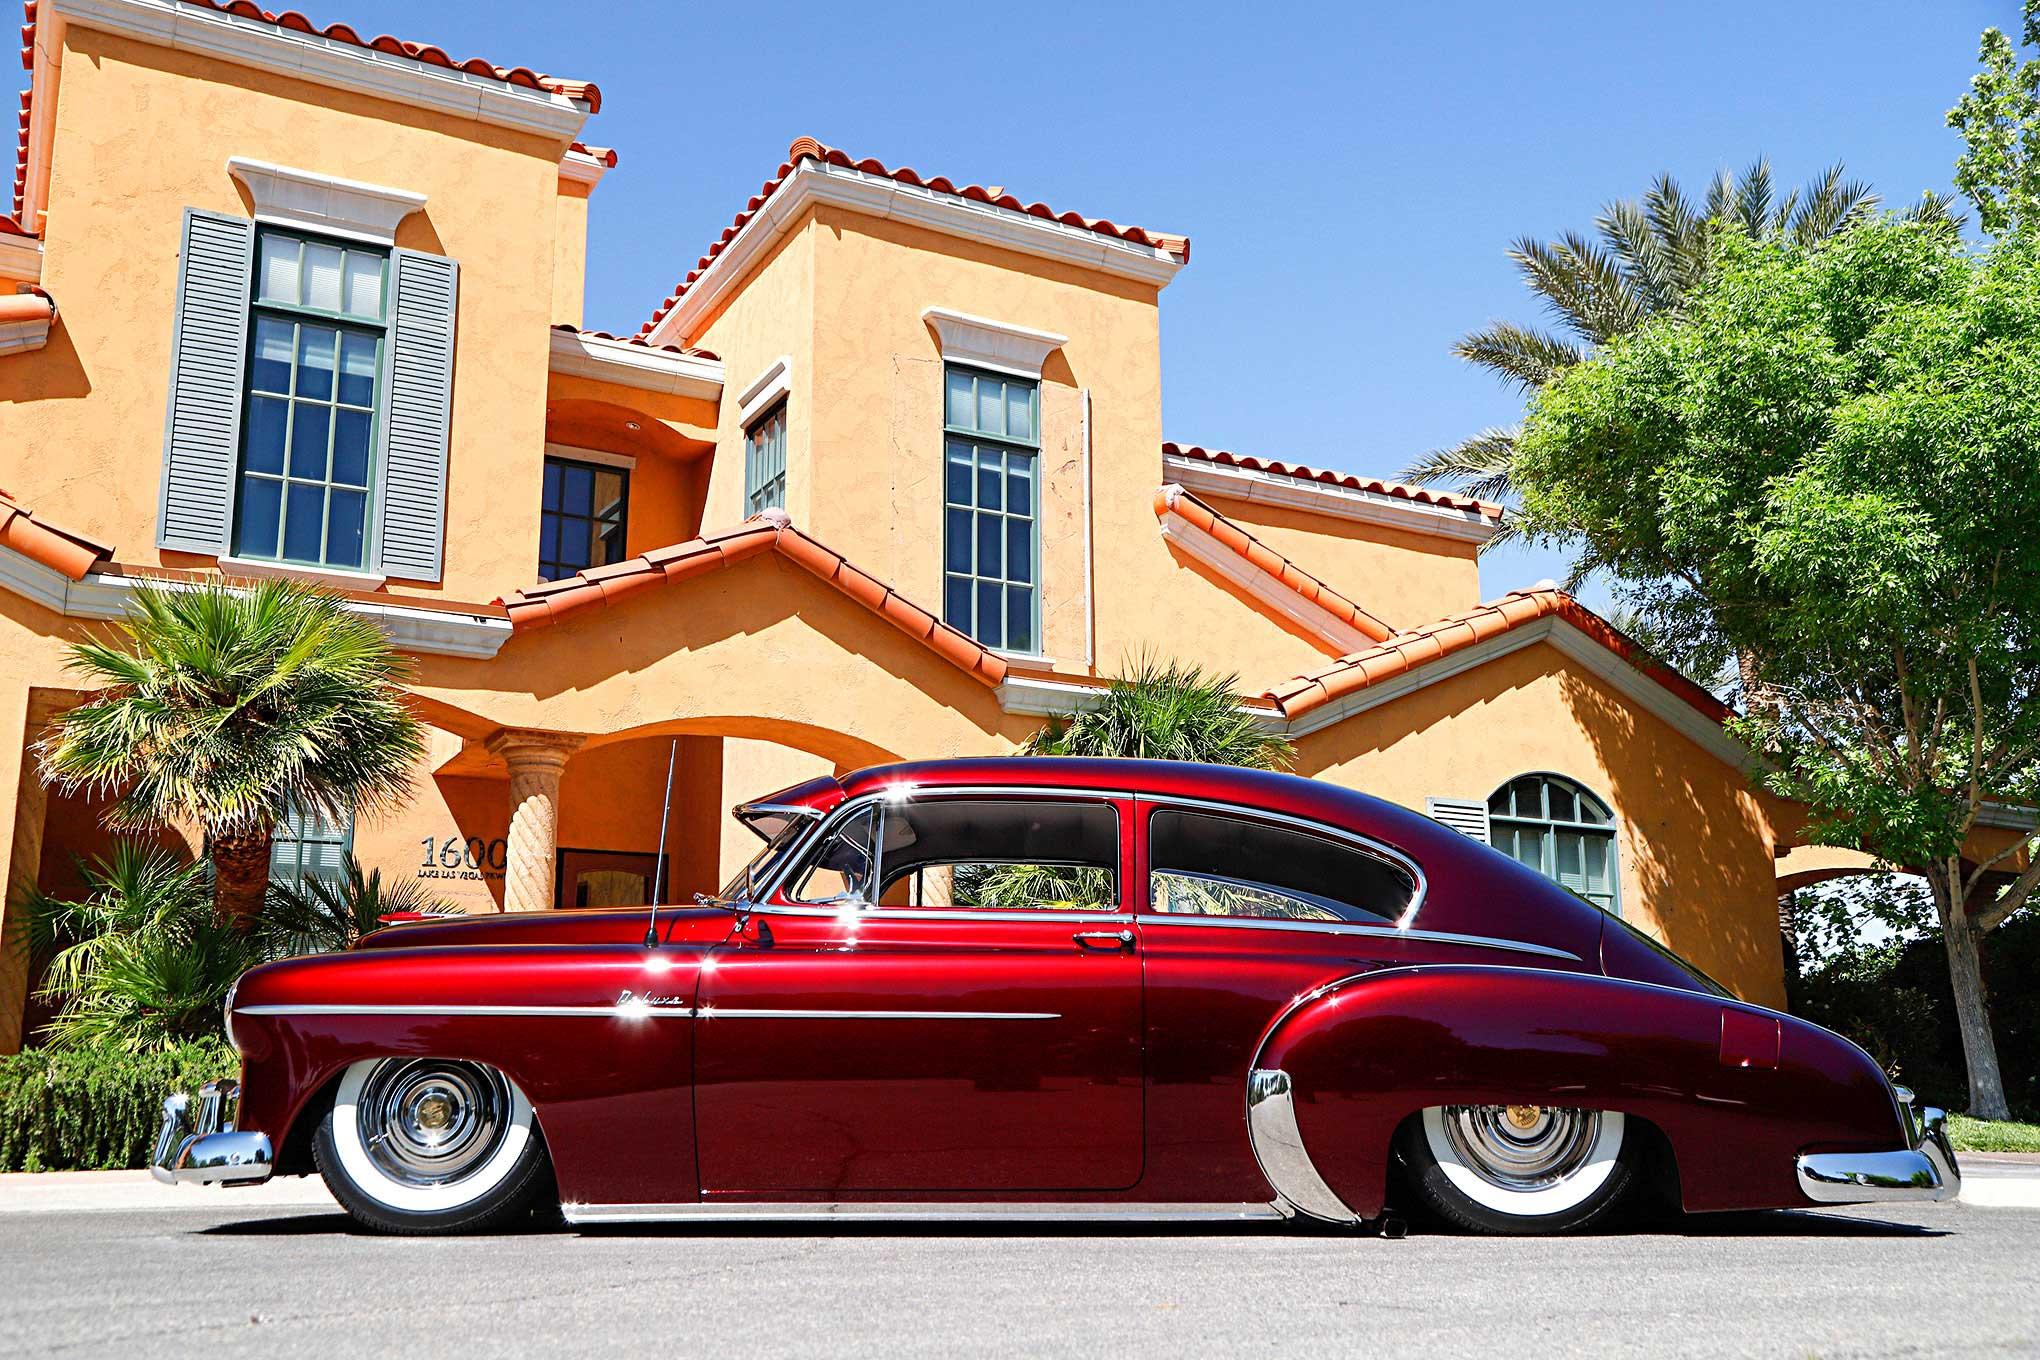 1949 Chevrolet Fleetline Deluxe - The Promise